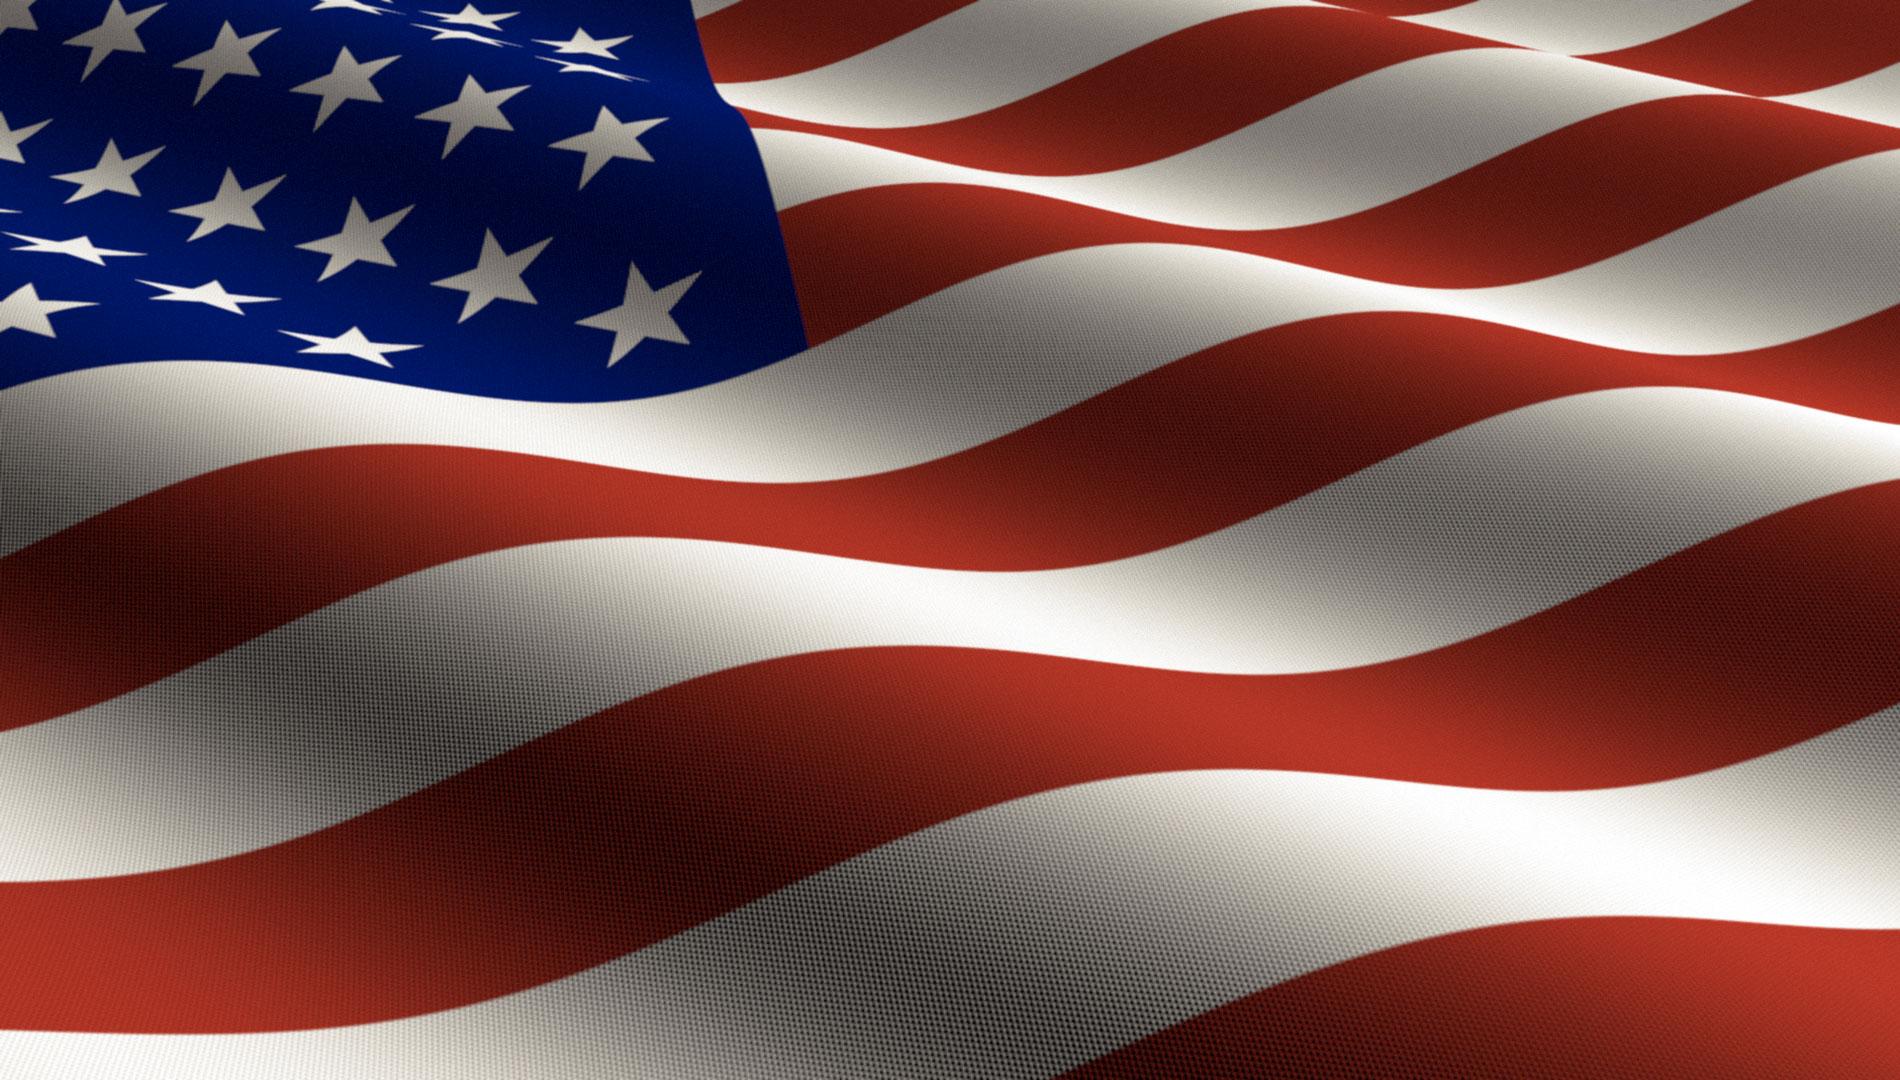 American Flag Desktop Wallpaper HD